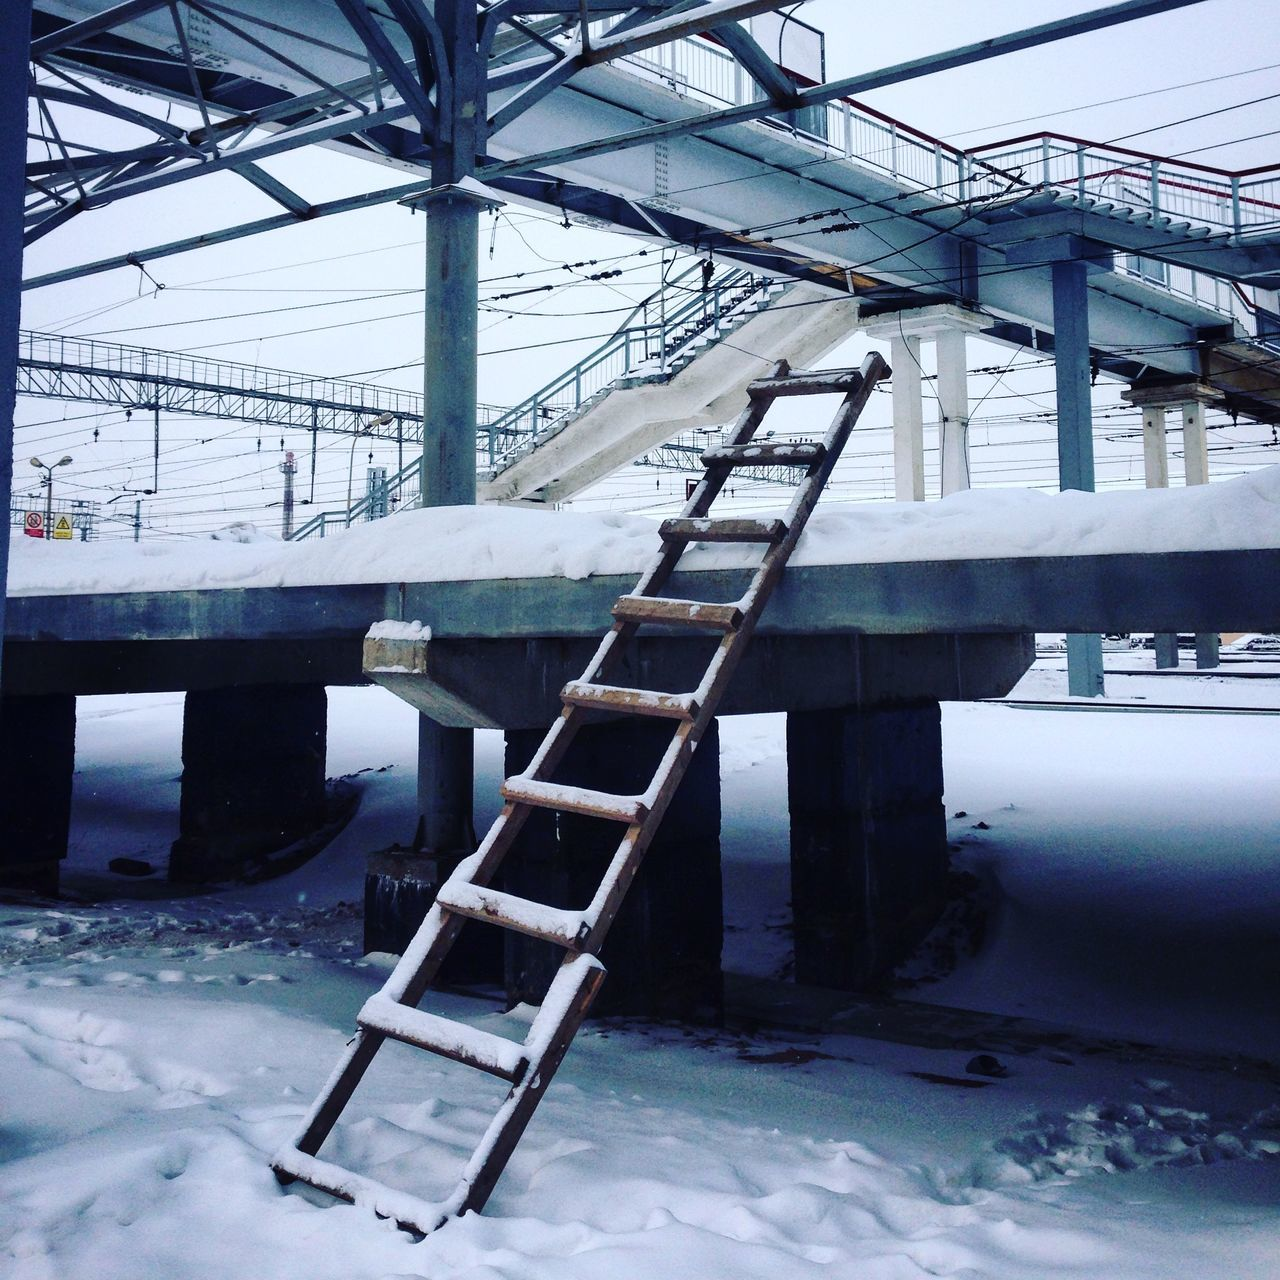 Ladder on snow covered land